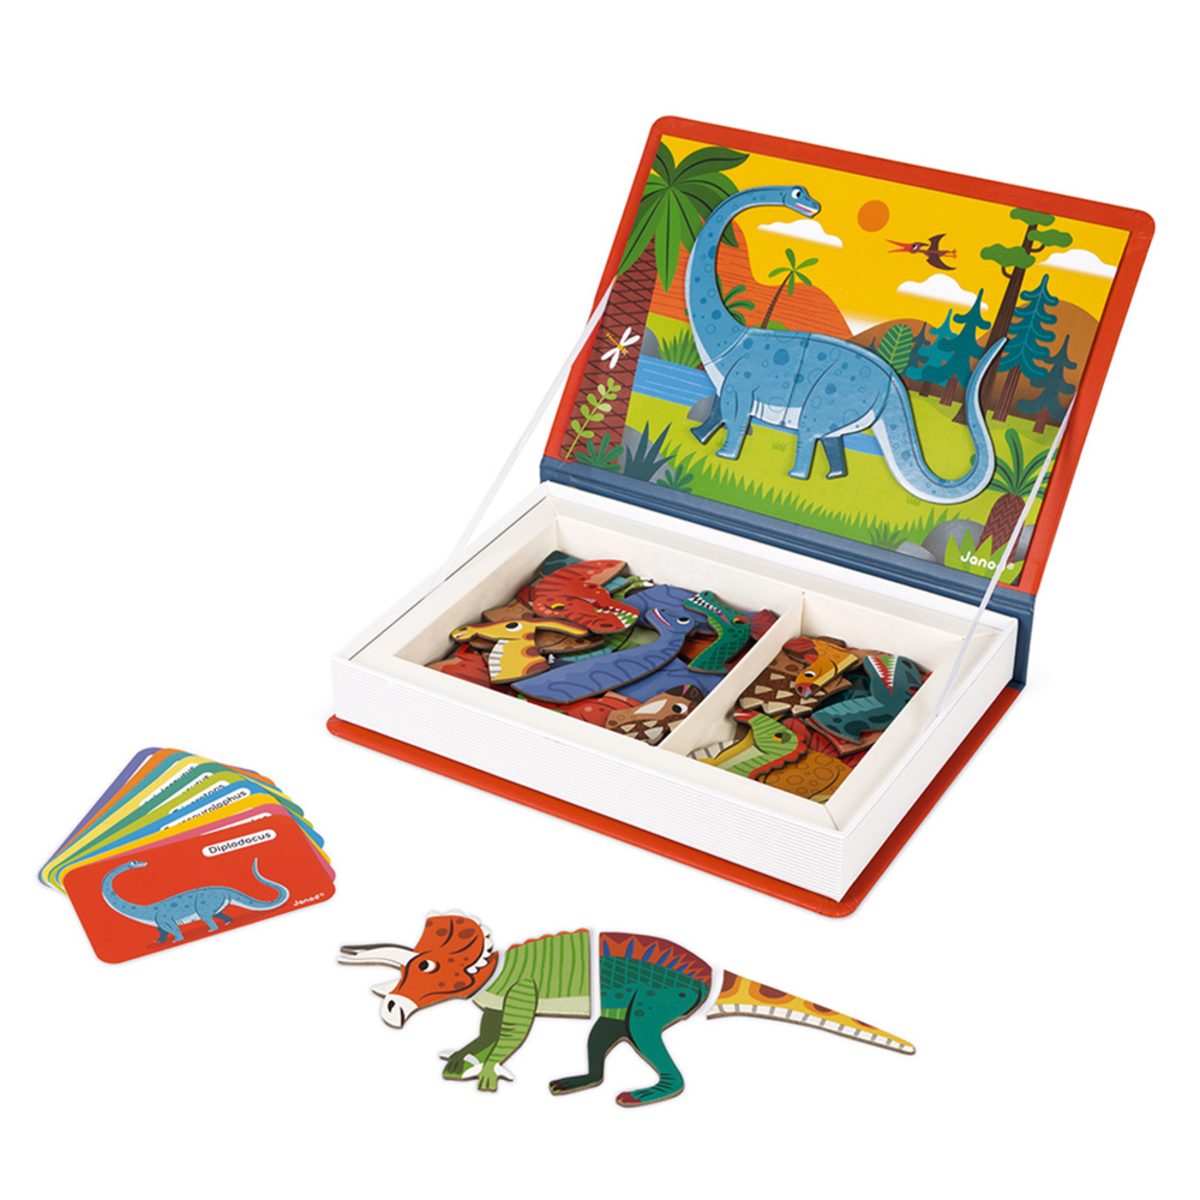 Mes premiers jouets Magnéti'Book Dinosaures Magnéti'Book Dinosaures